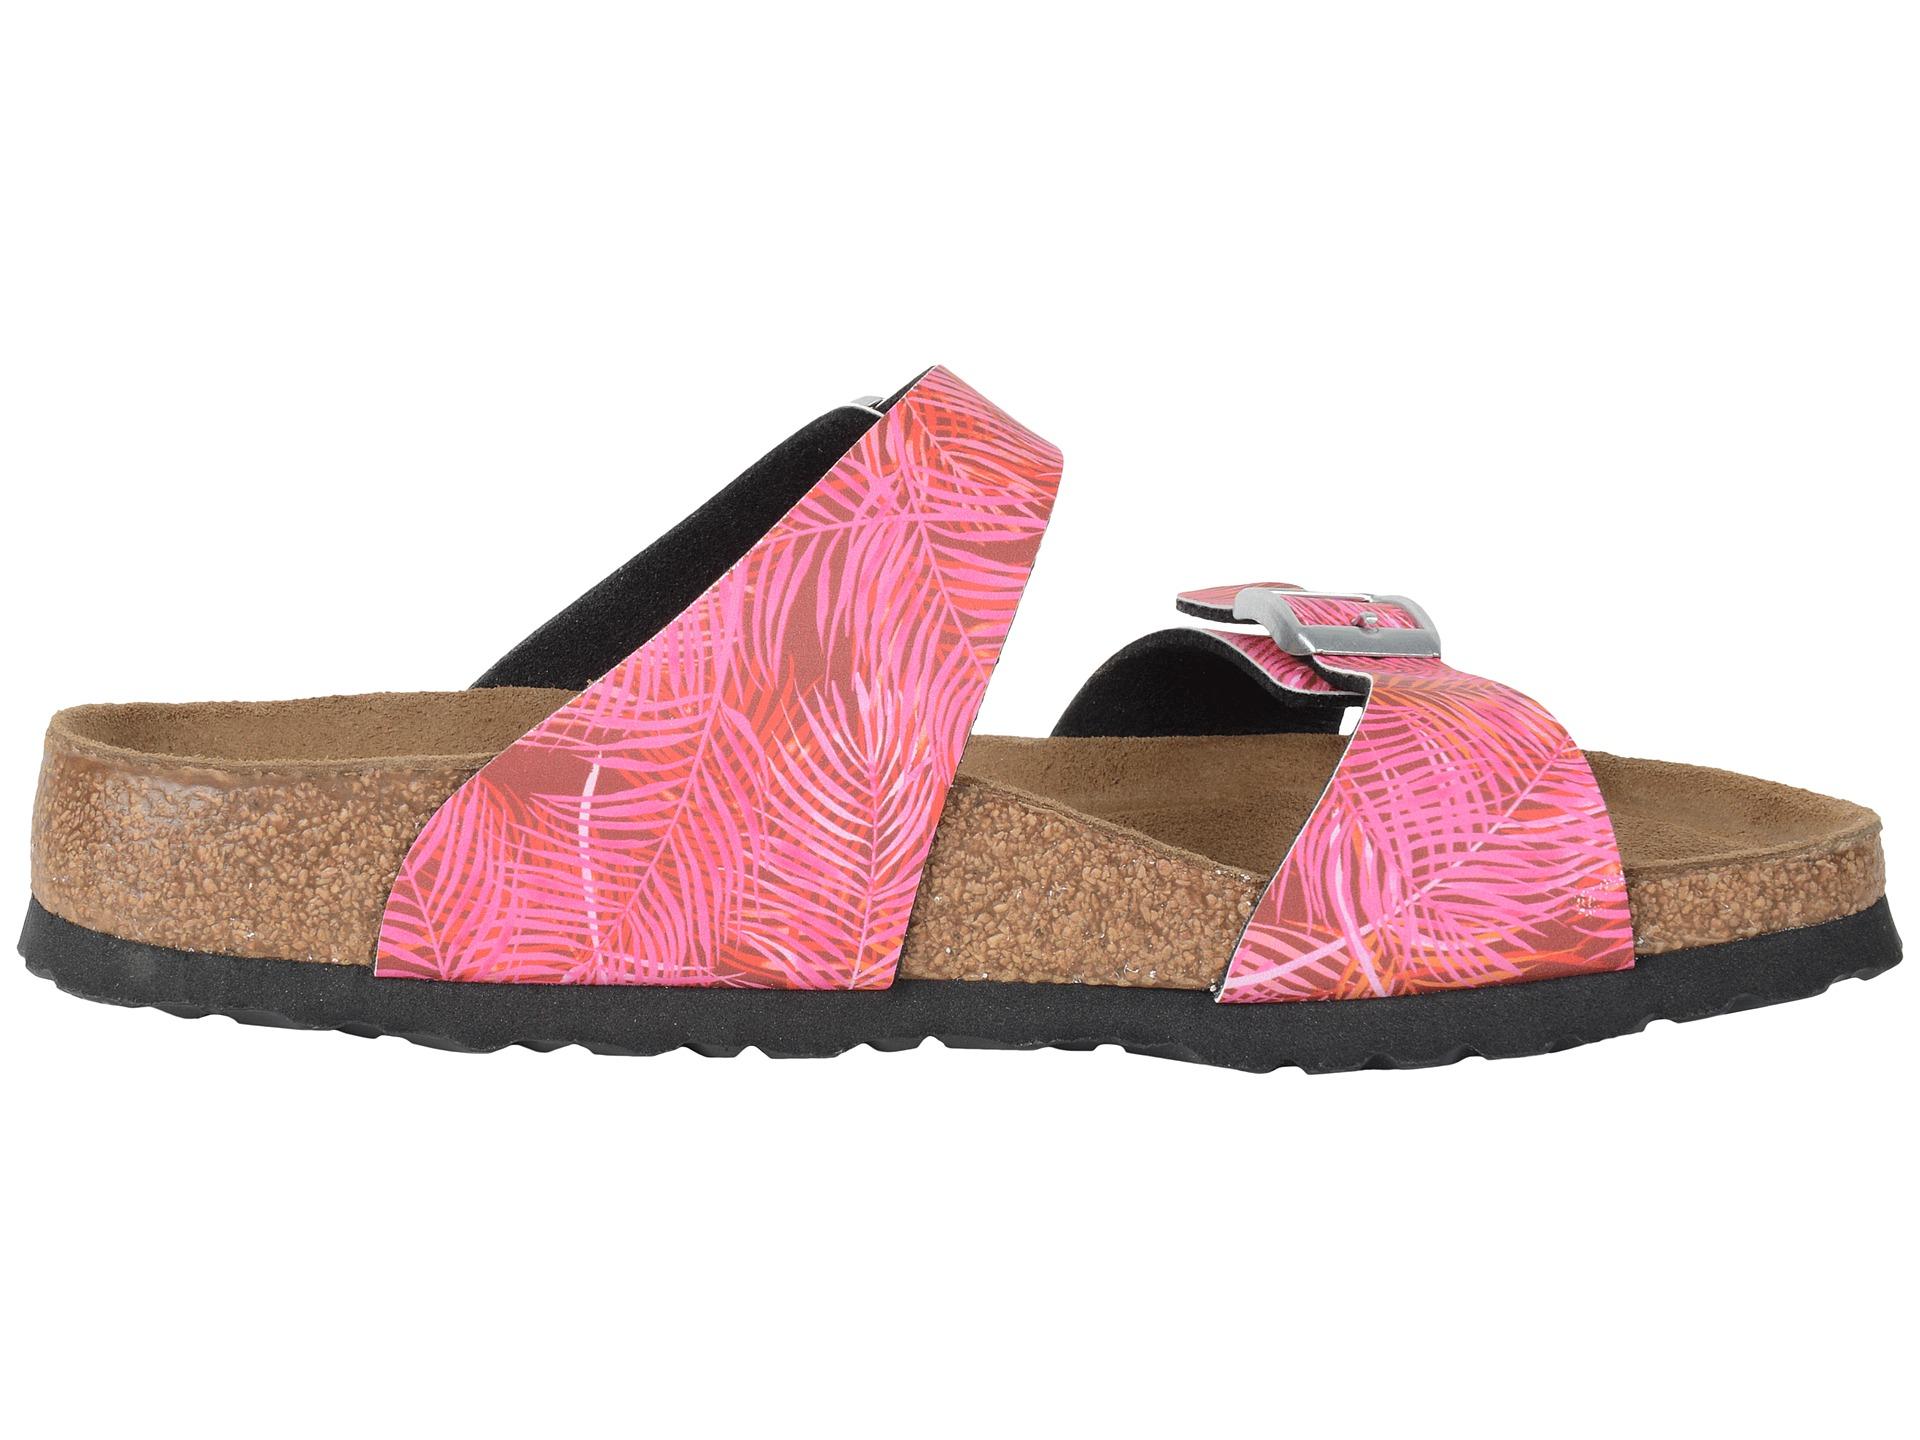 014bdca4882 Birkenstock Riva Slippers For Men Softmoc